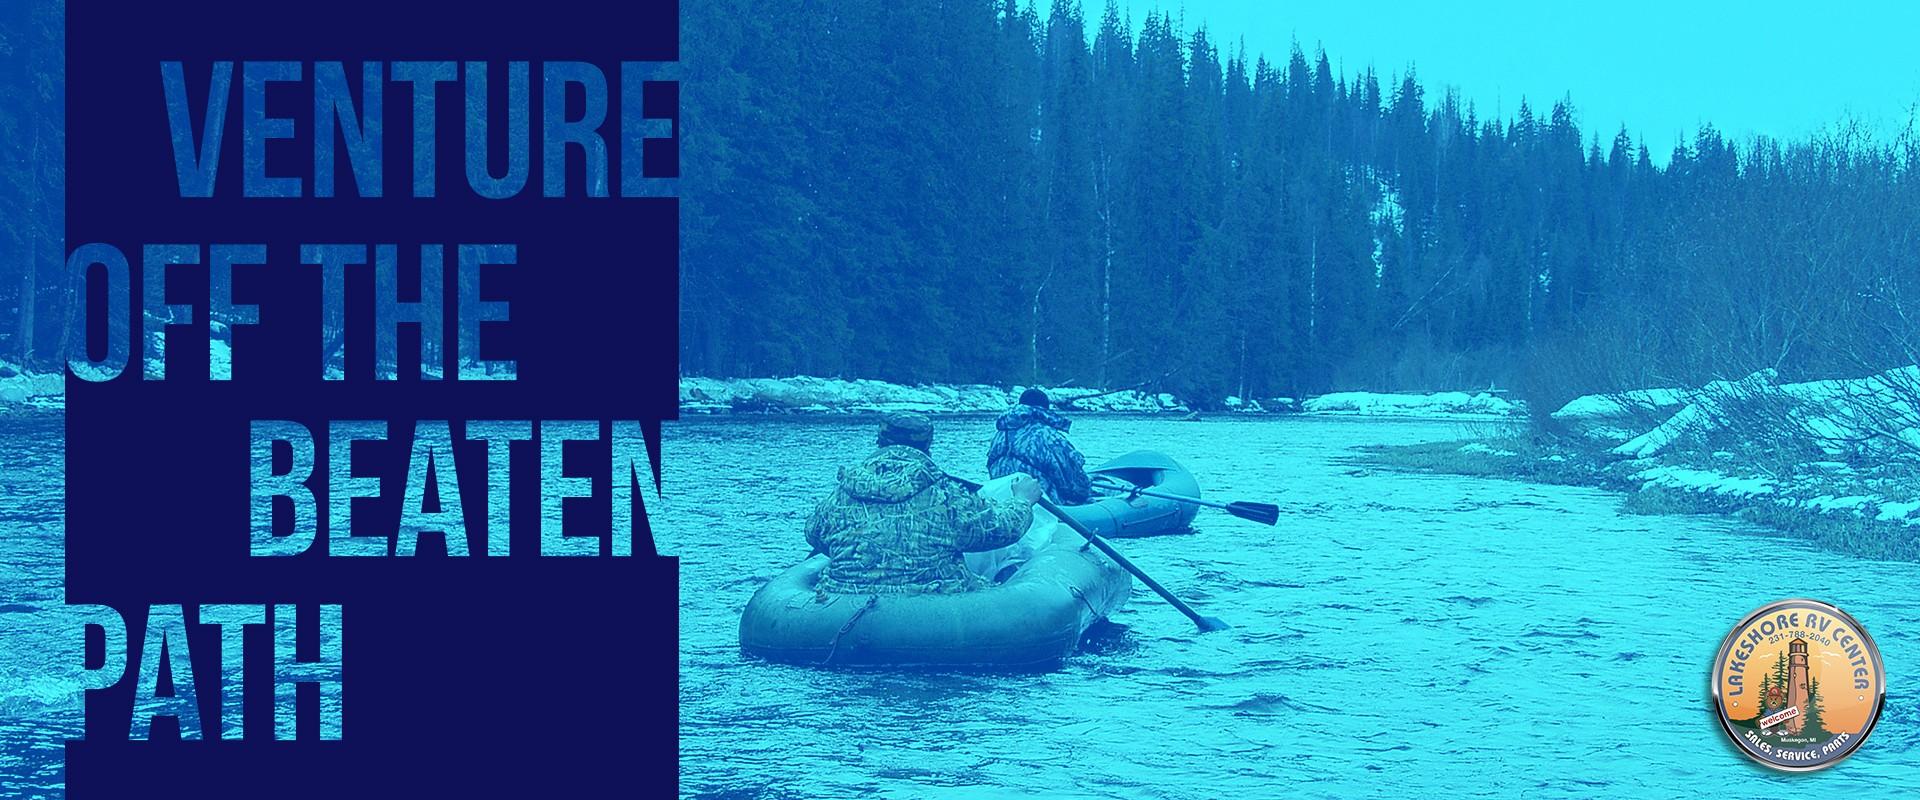 Winter water rafting in Michigan. Venture off the beaten path.